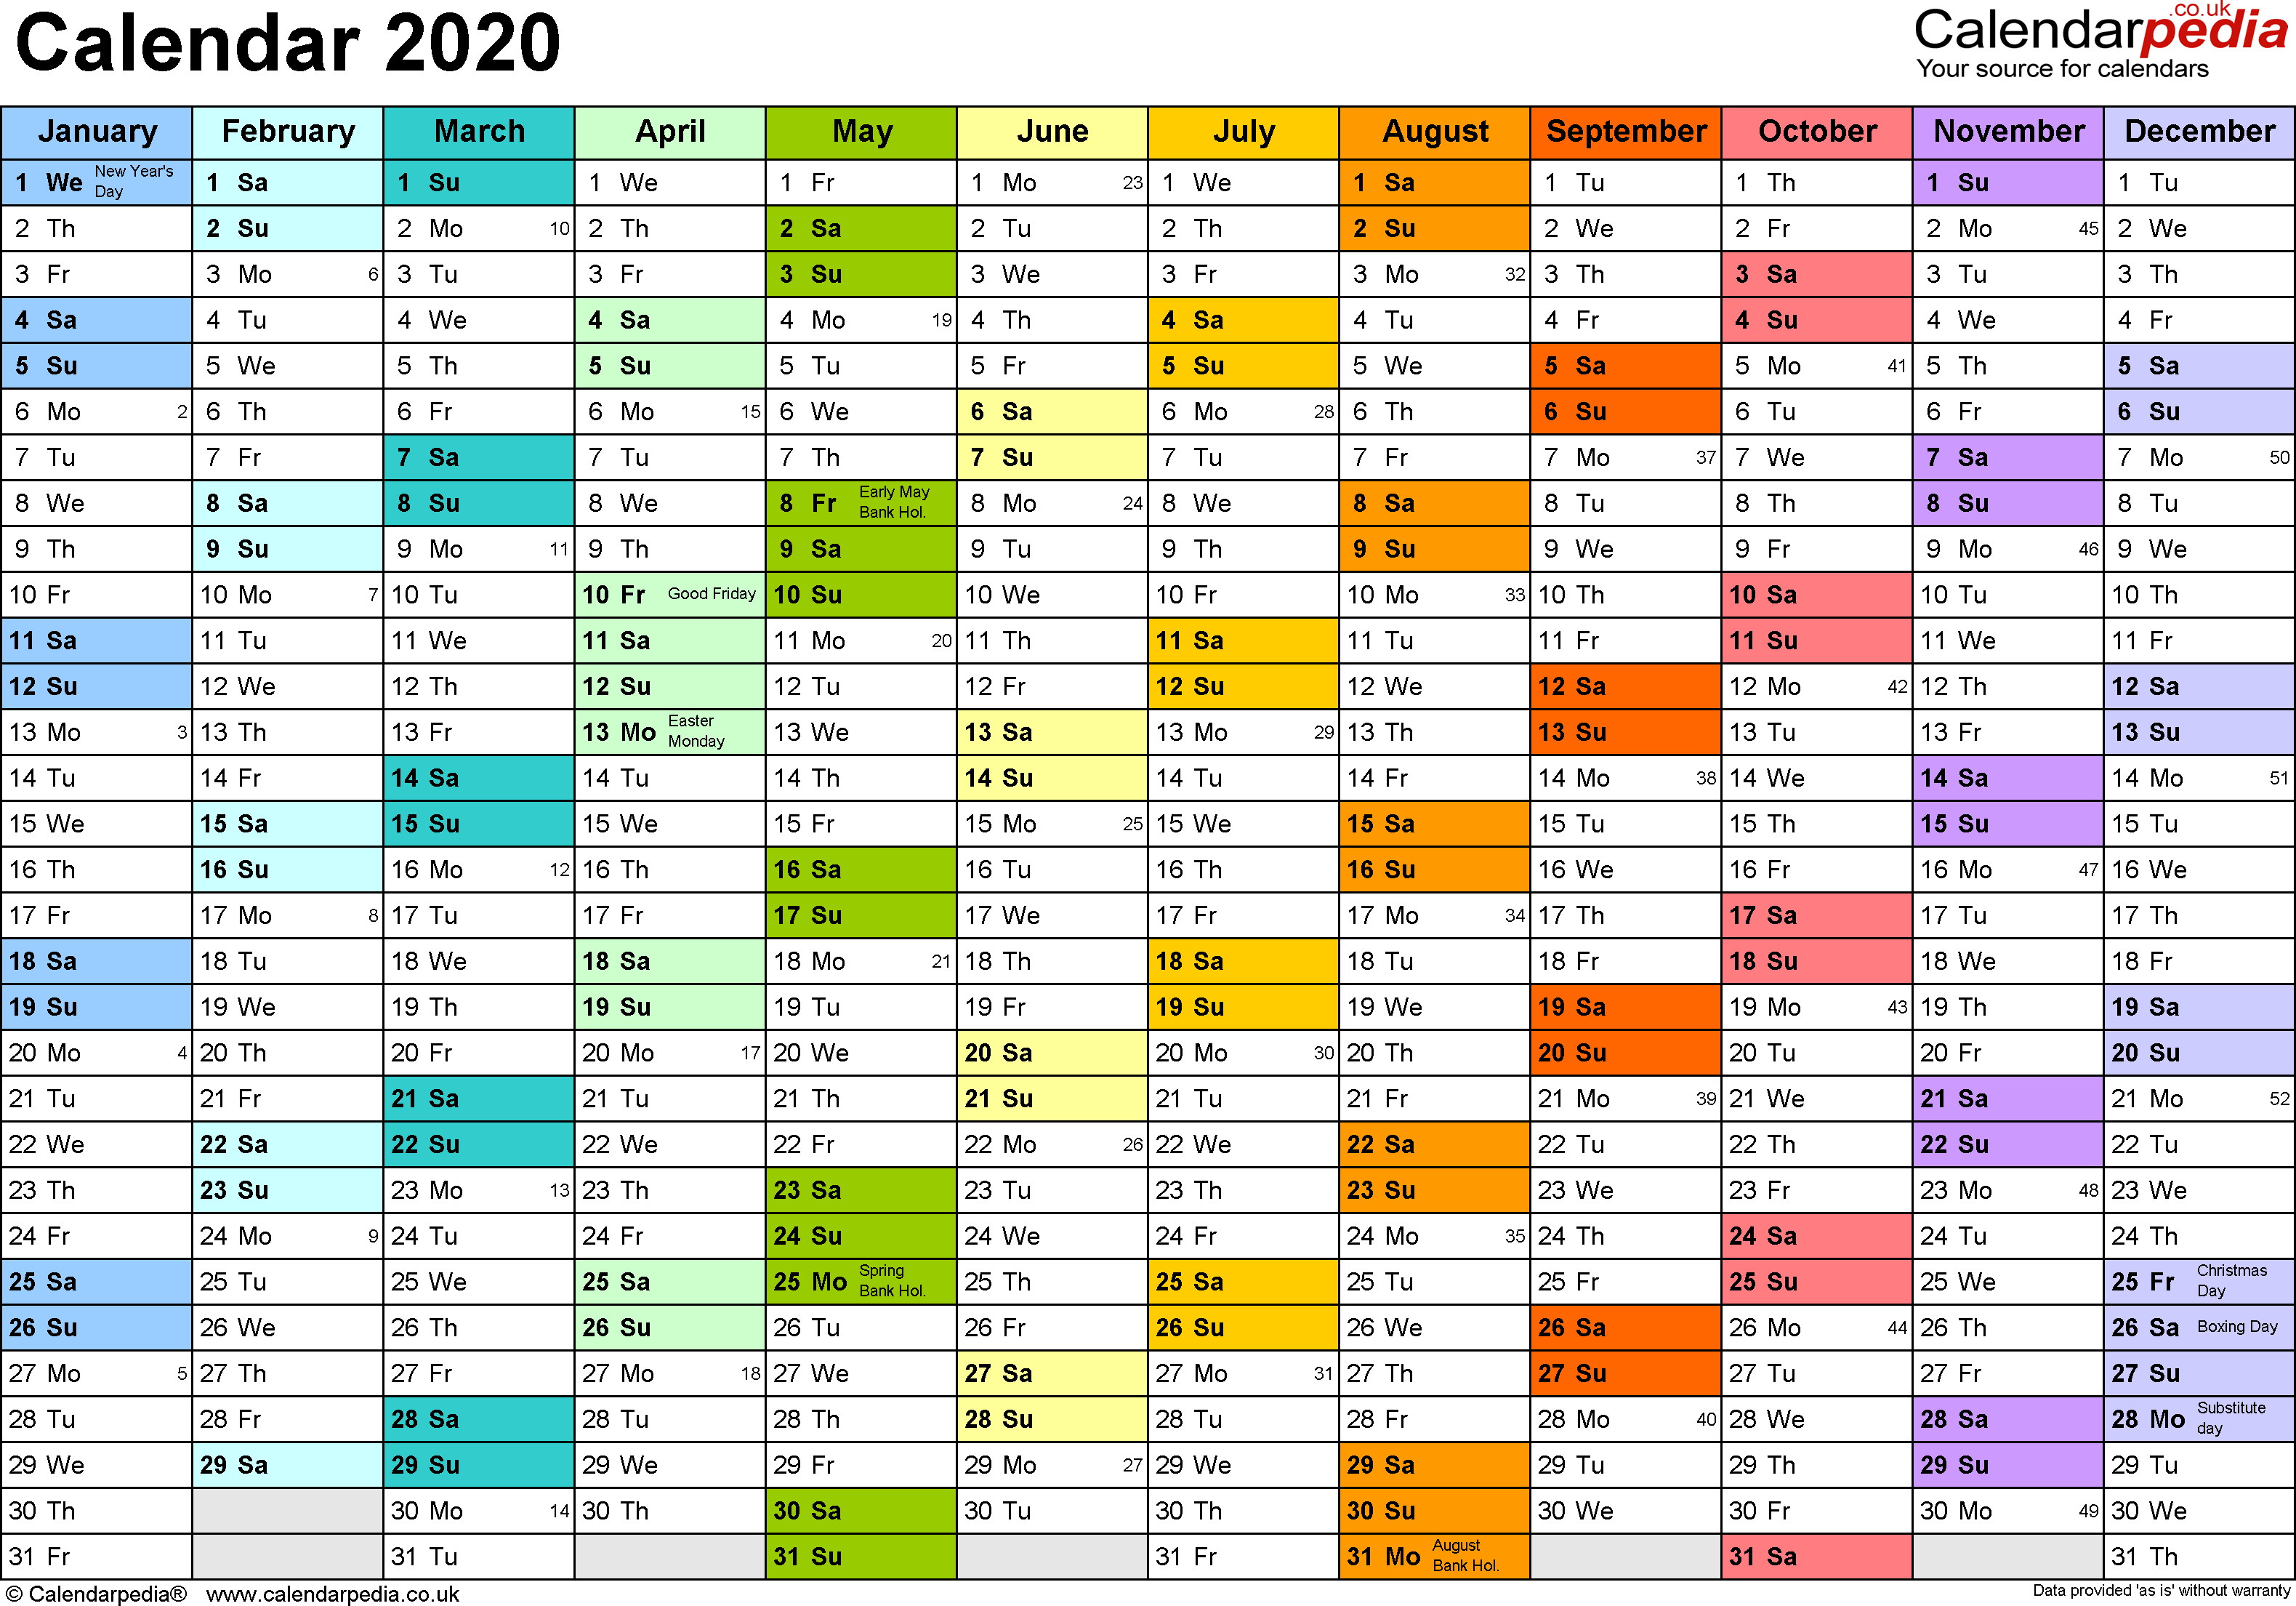 Calendar 2020 (Uk) - 16 Free Printable Word Templates